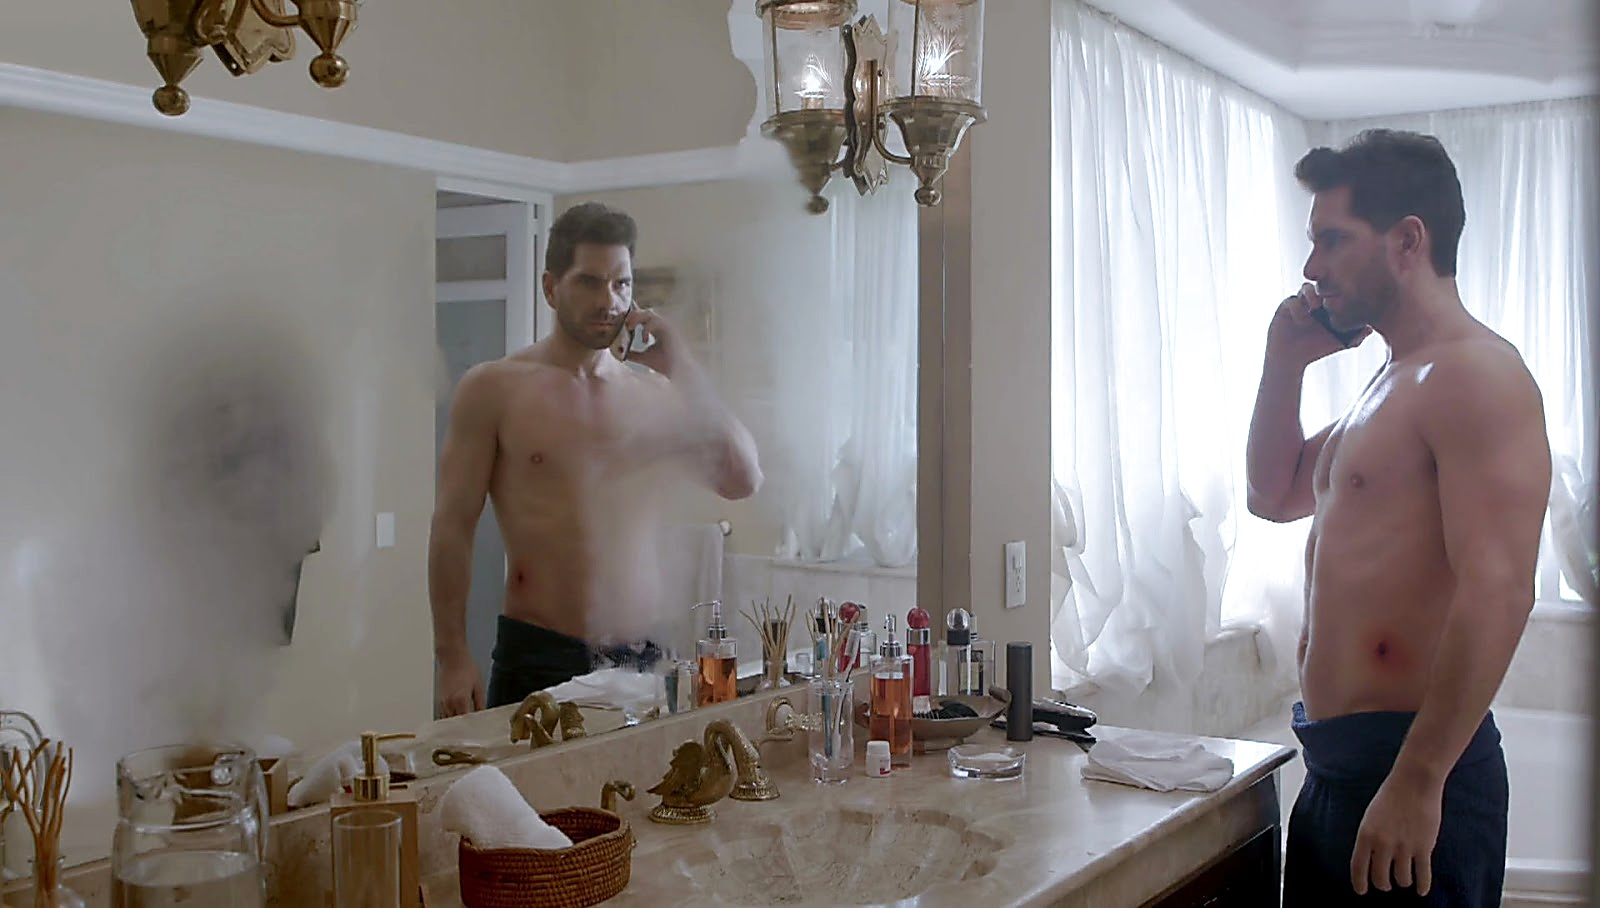 Arap Bethke sexy shirtless scene April 11, 2017, 12pm